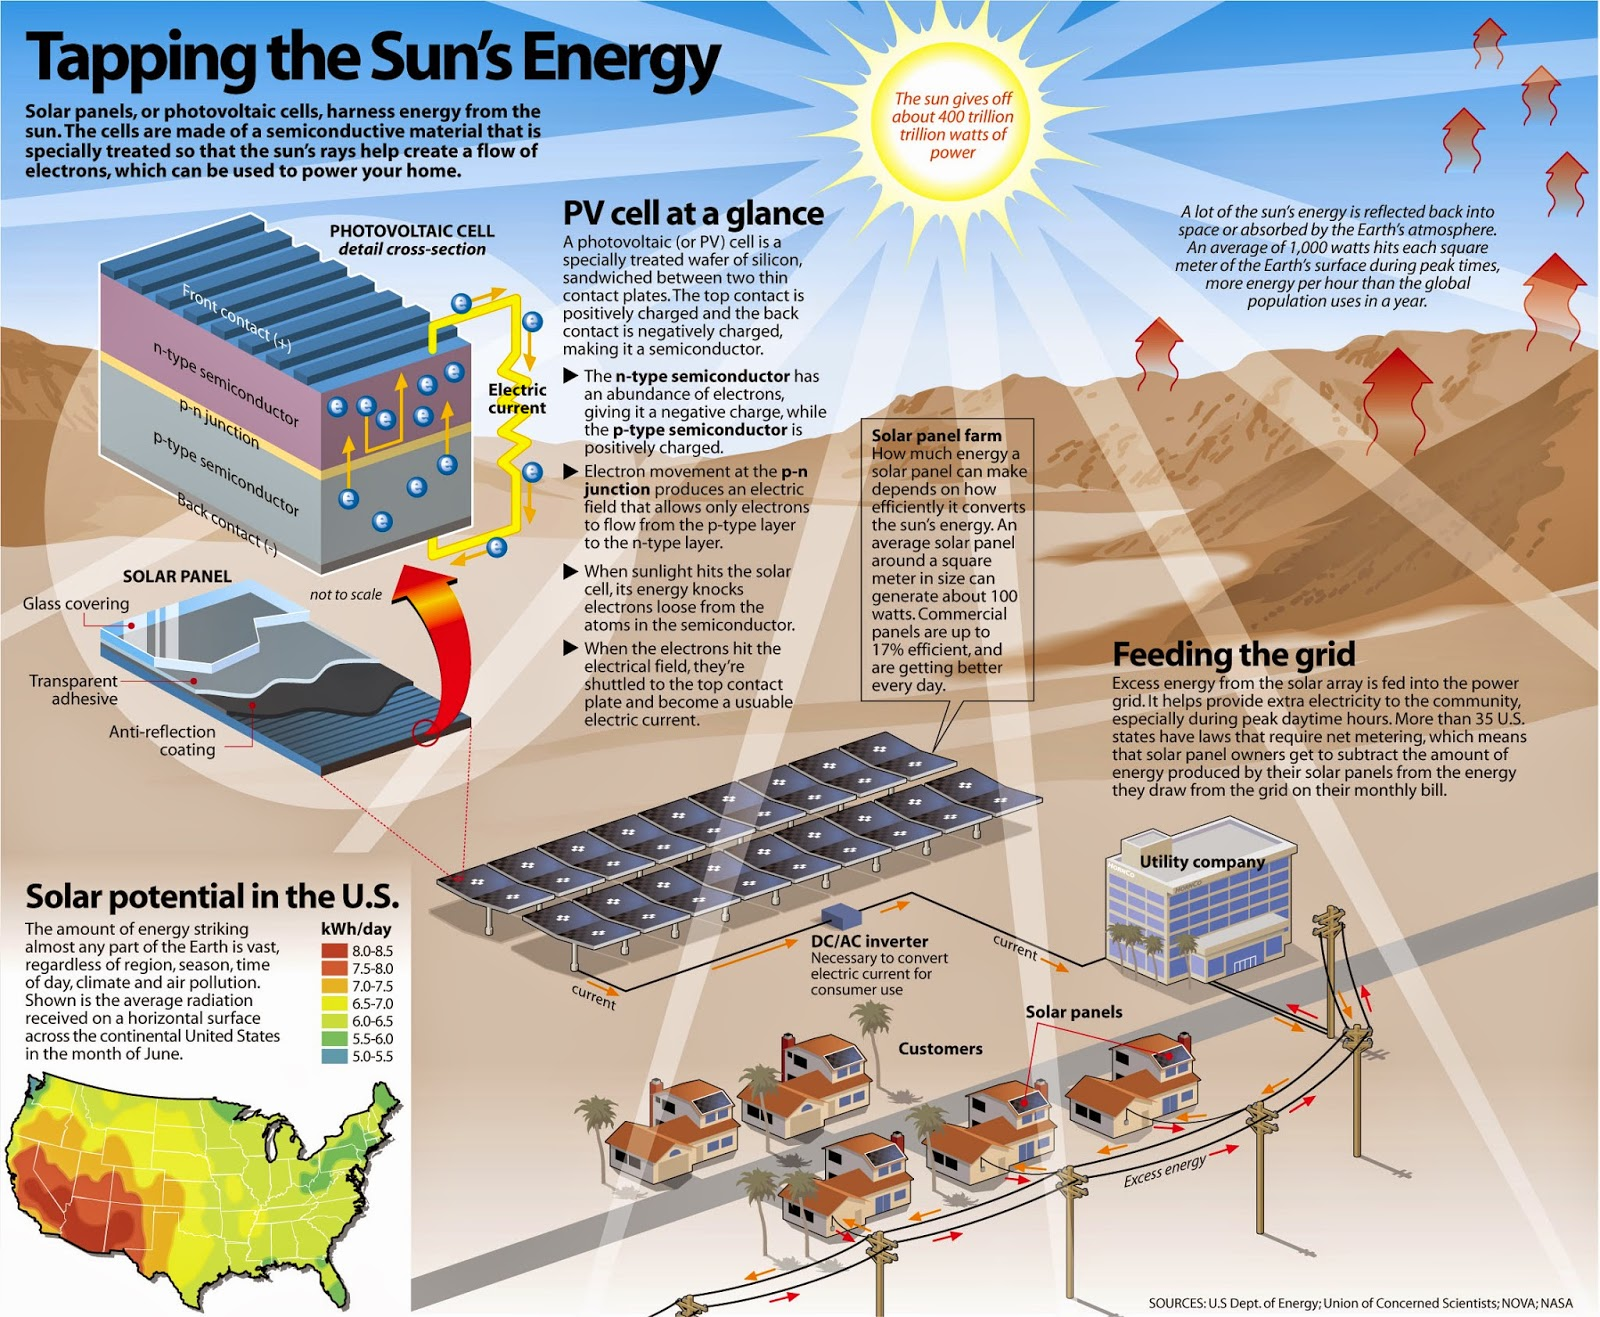 sun power,harnessing sun power,solar power collection,collect solar  power,solar absorption,solar power,solar technology,sun technology